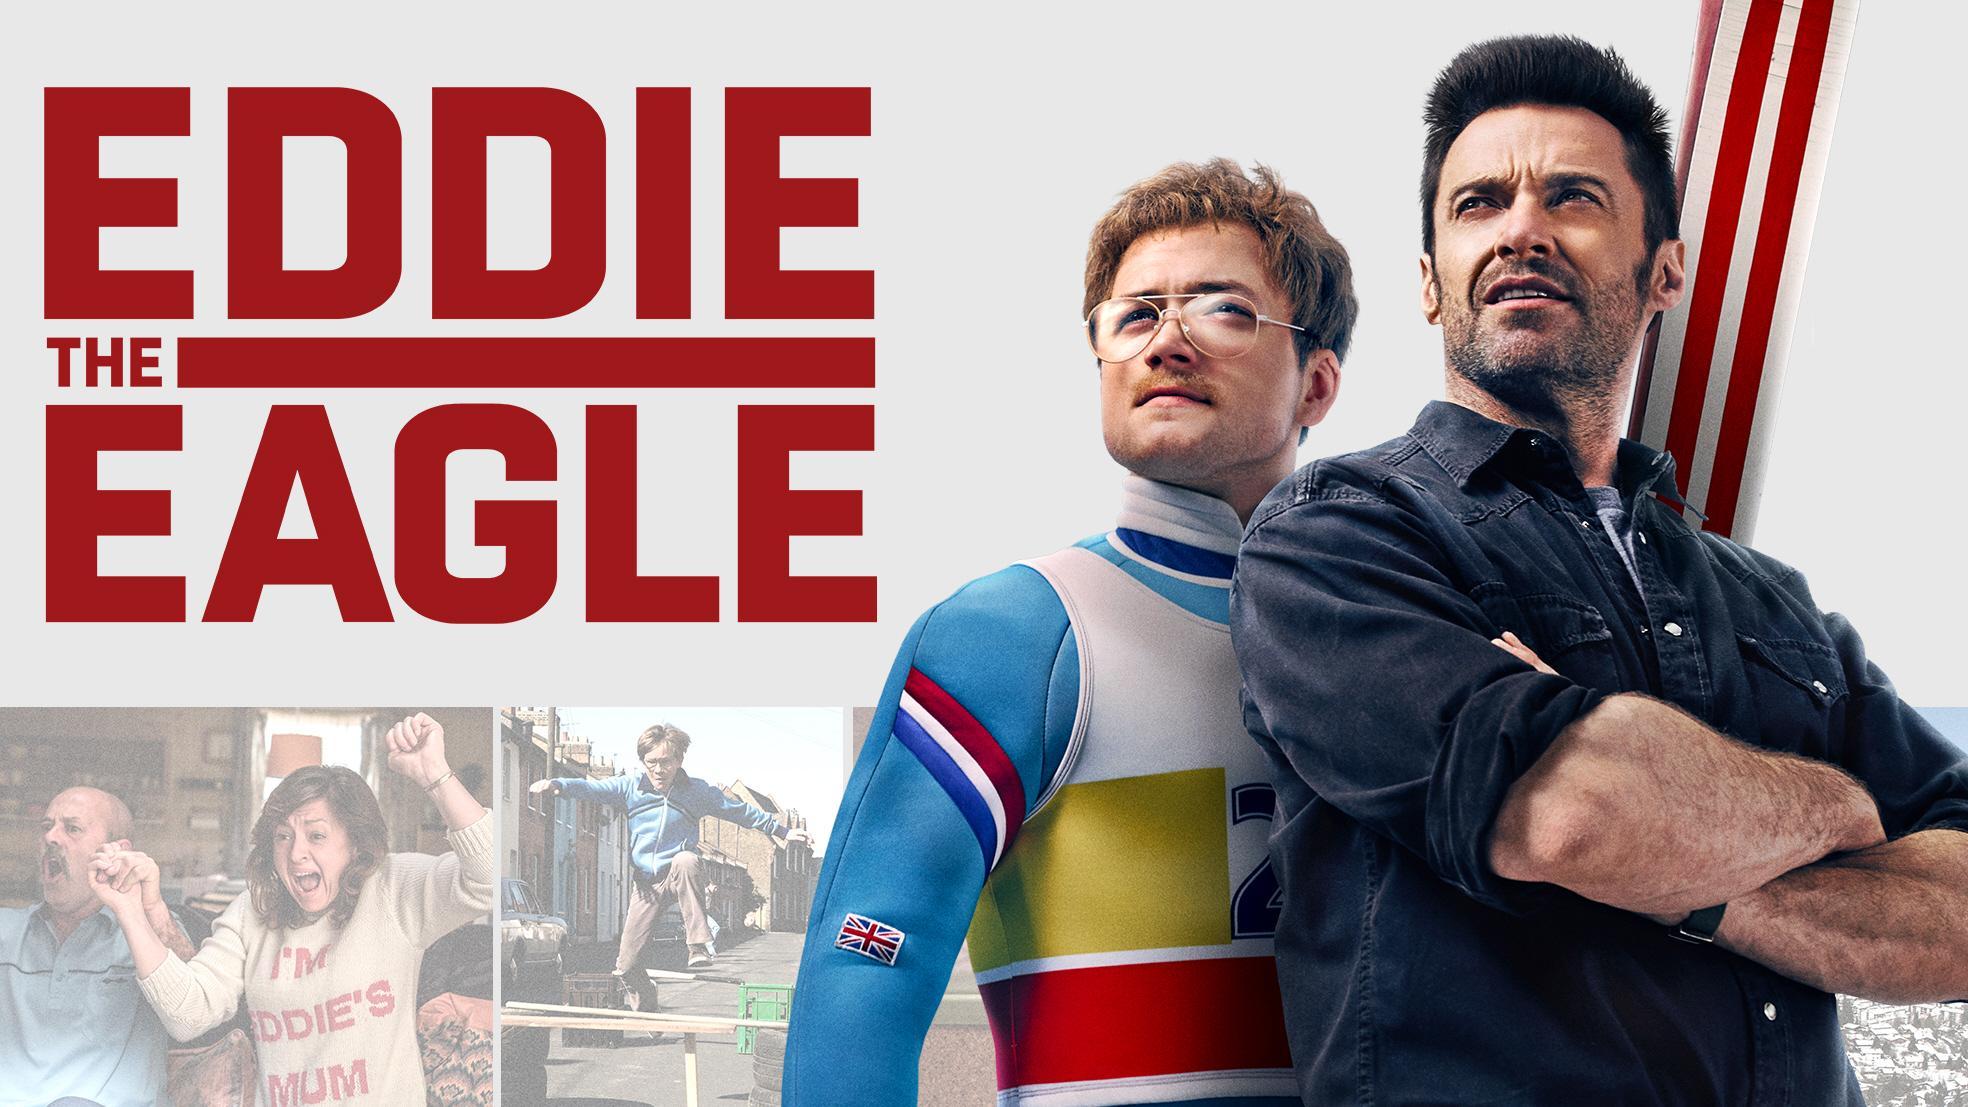 eddie the eagle stream